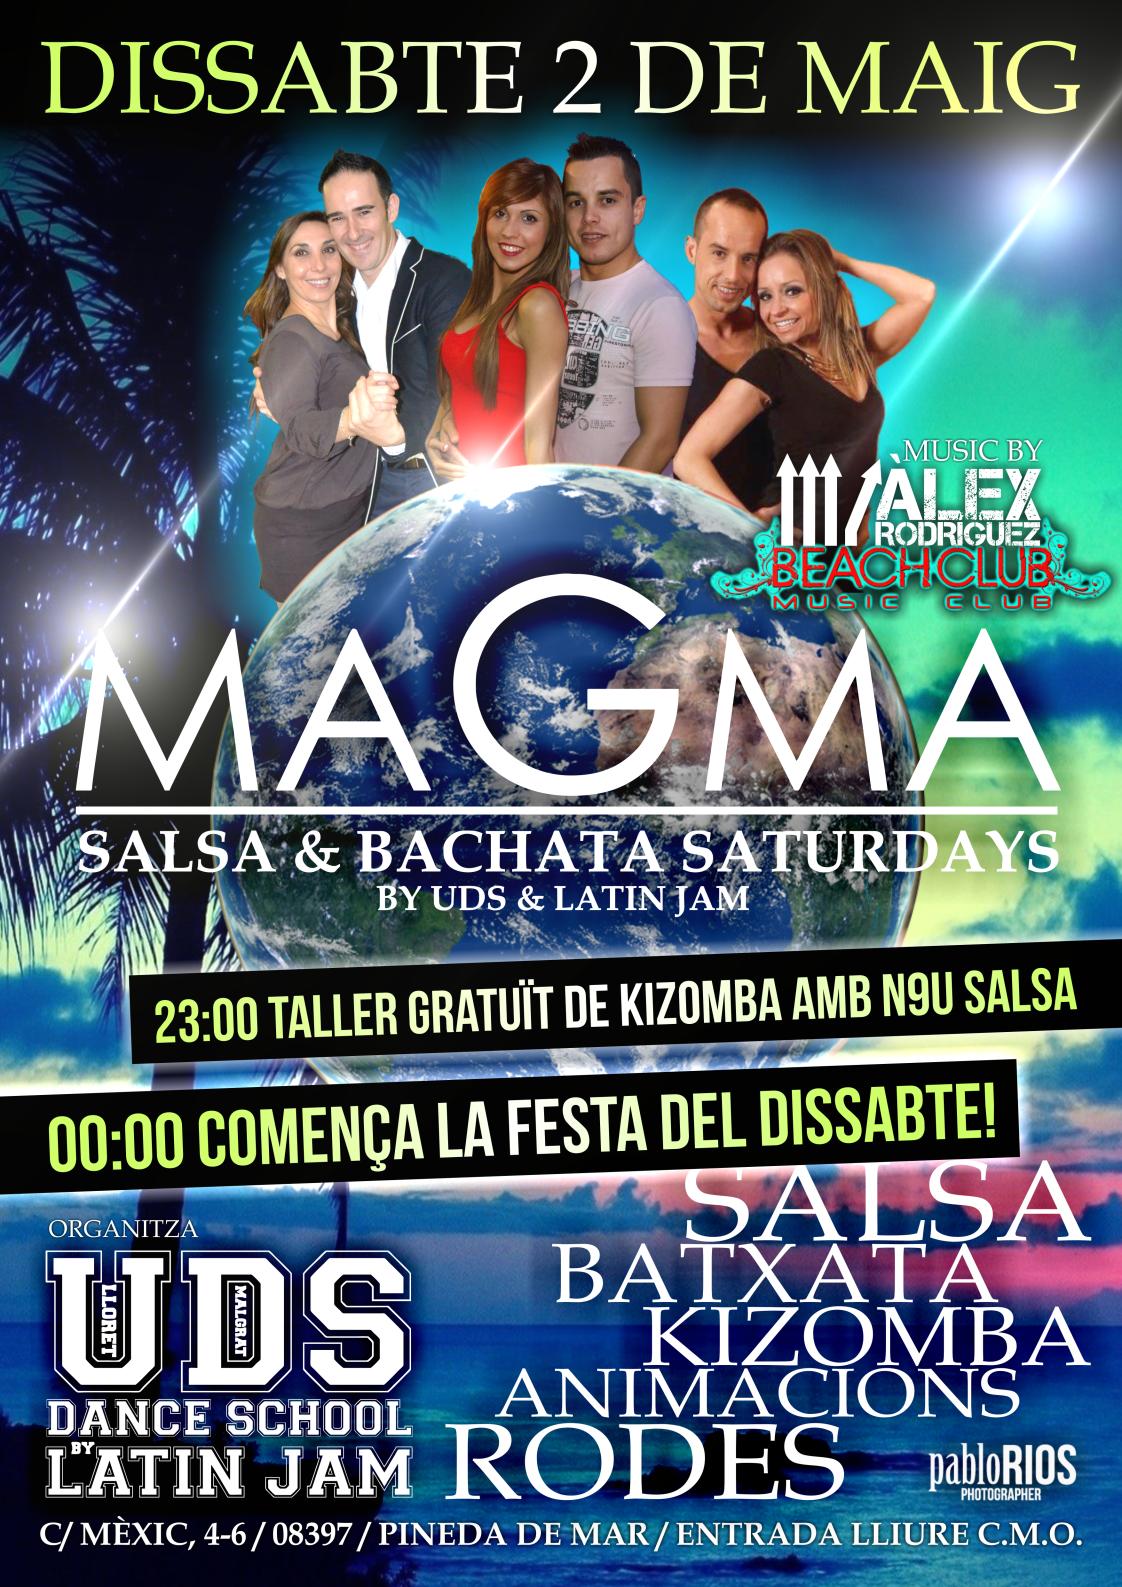 MAGMA PINEDA - 2 de MAYO 2015